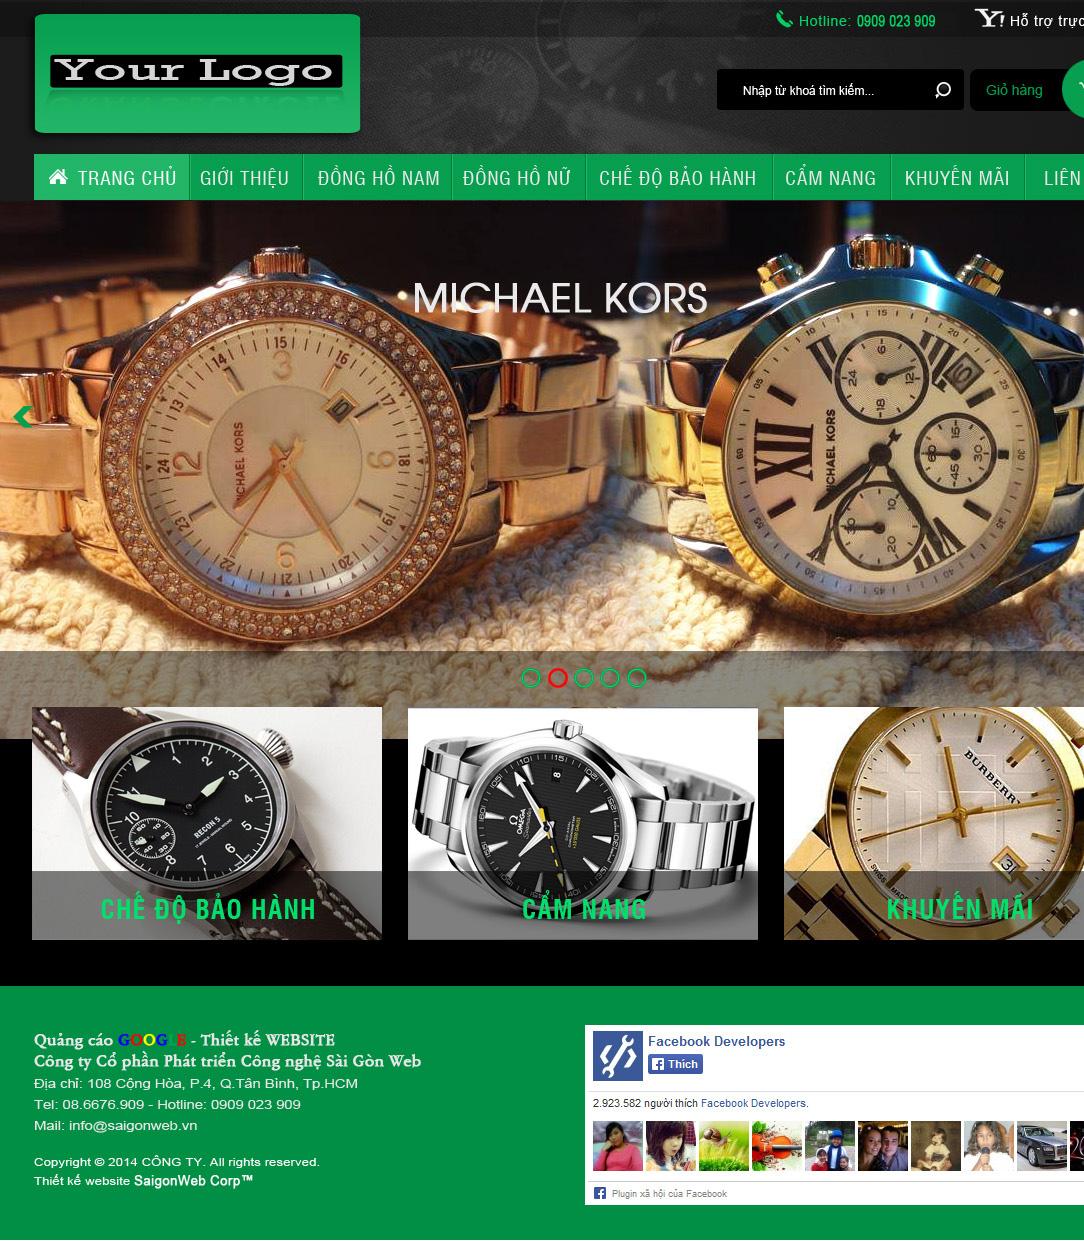 website thời trang1